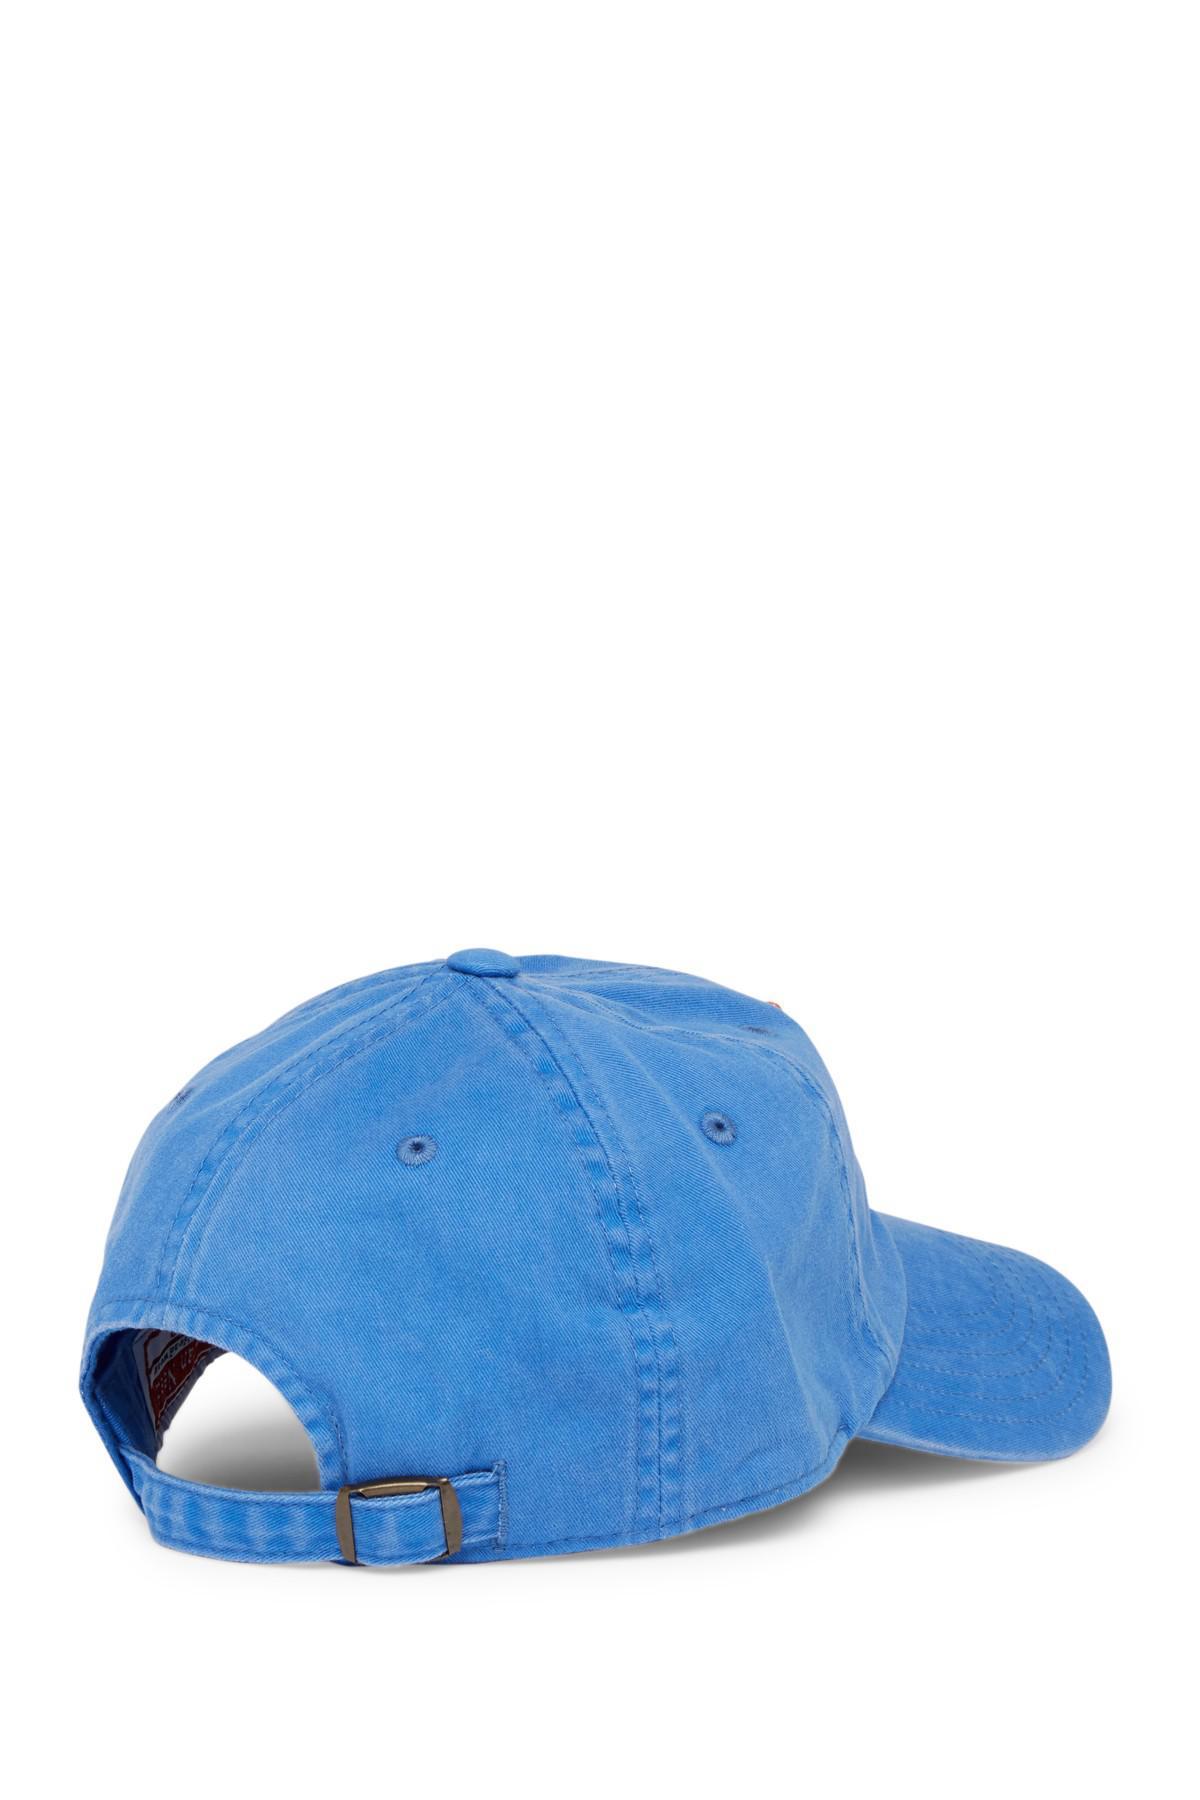 af47009f289 Lyst - American Needle New Raglan Ny Mets Baseball Cap in Blue for Men